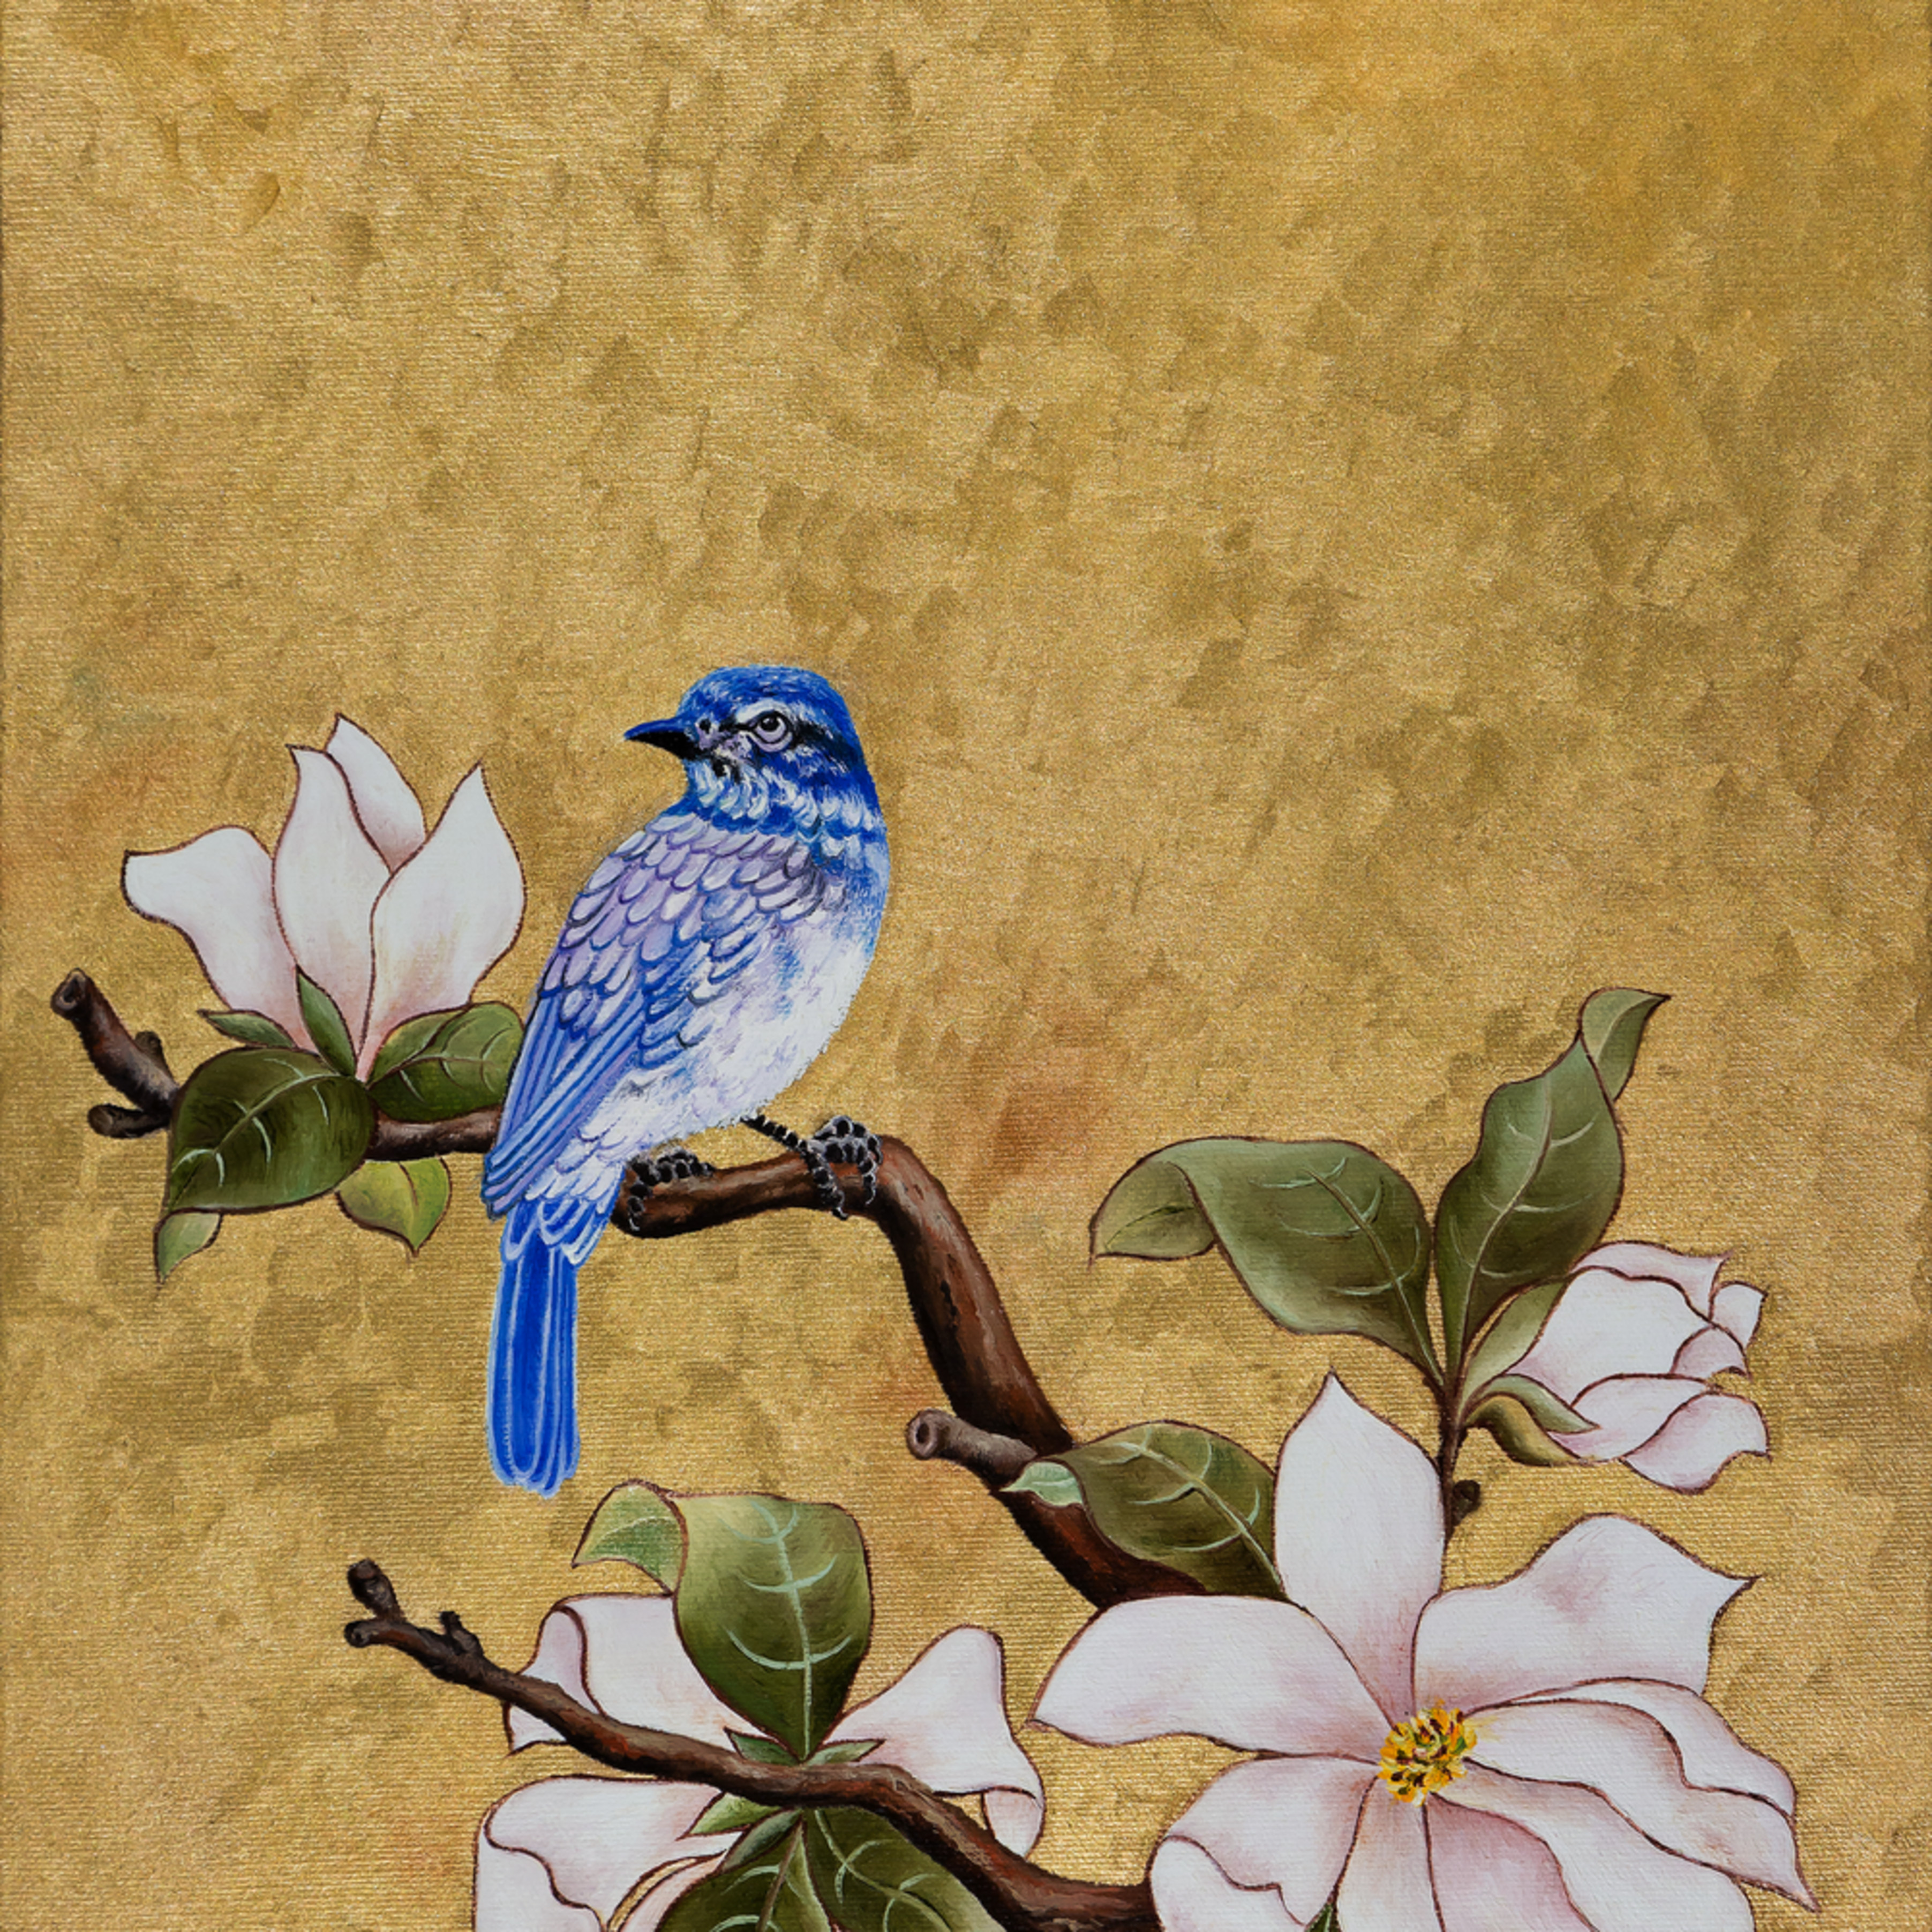 Blue bird 29a2824 sized sharpprint bopyeo